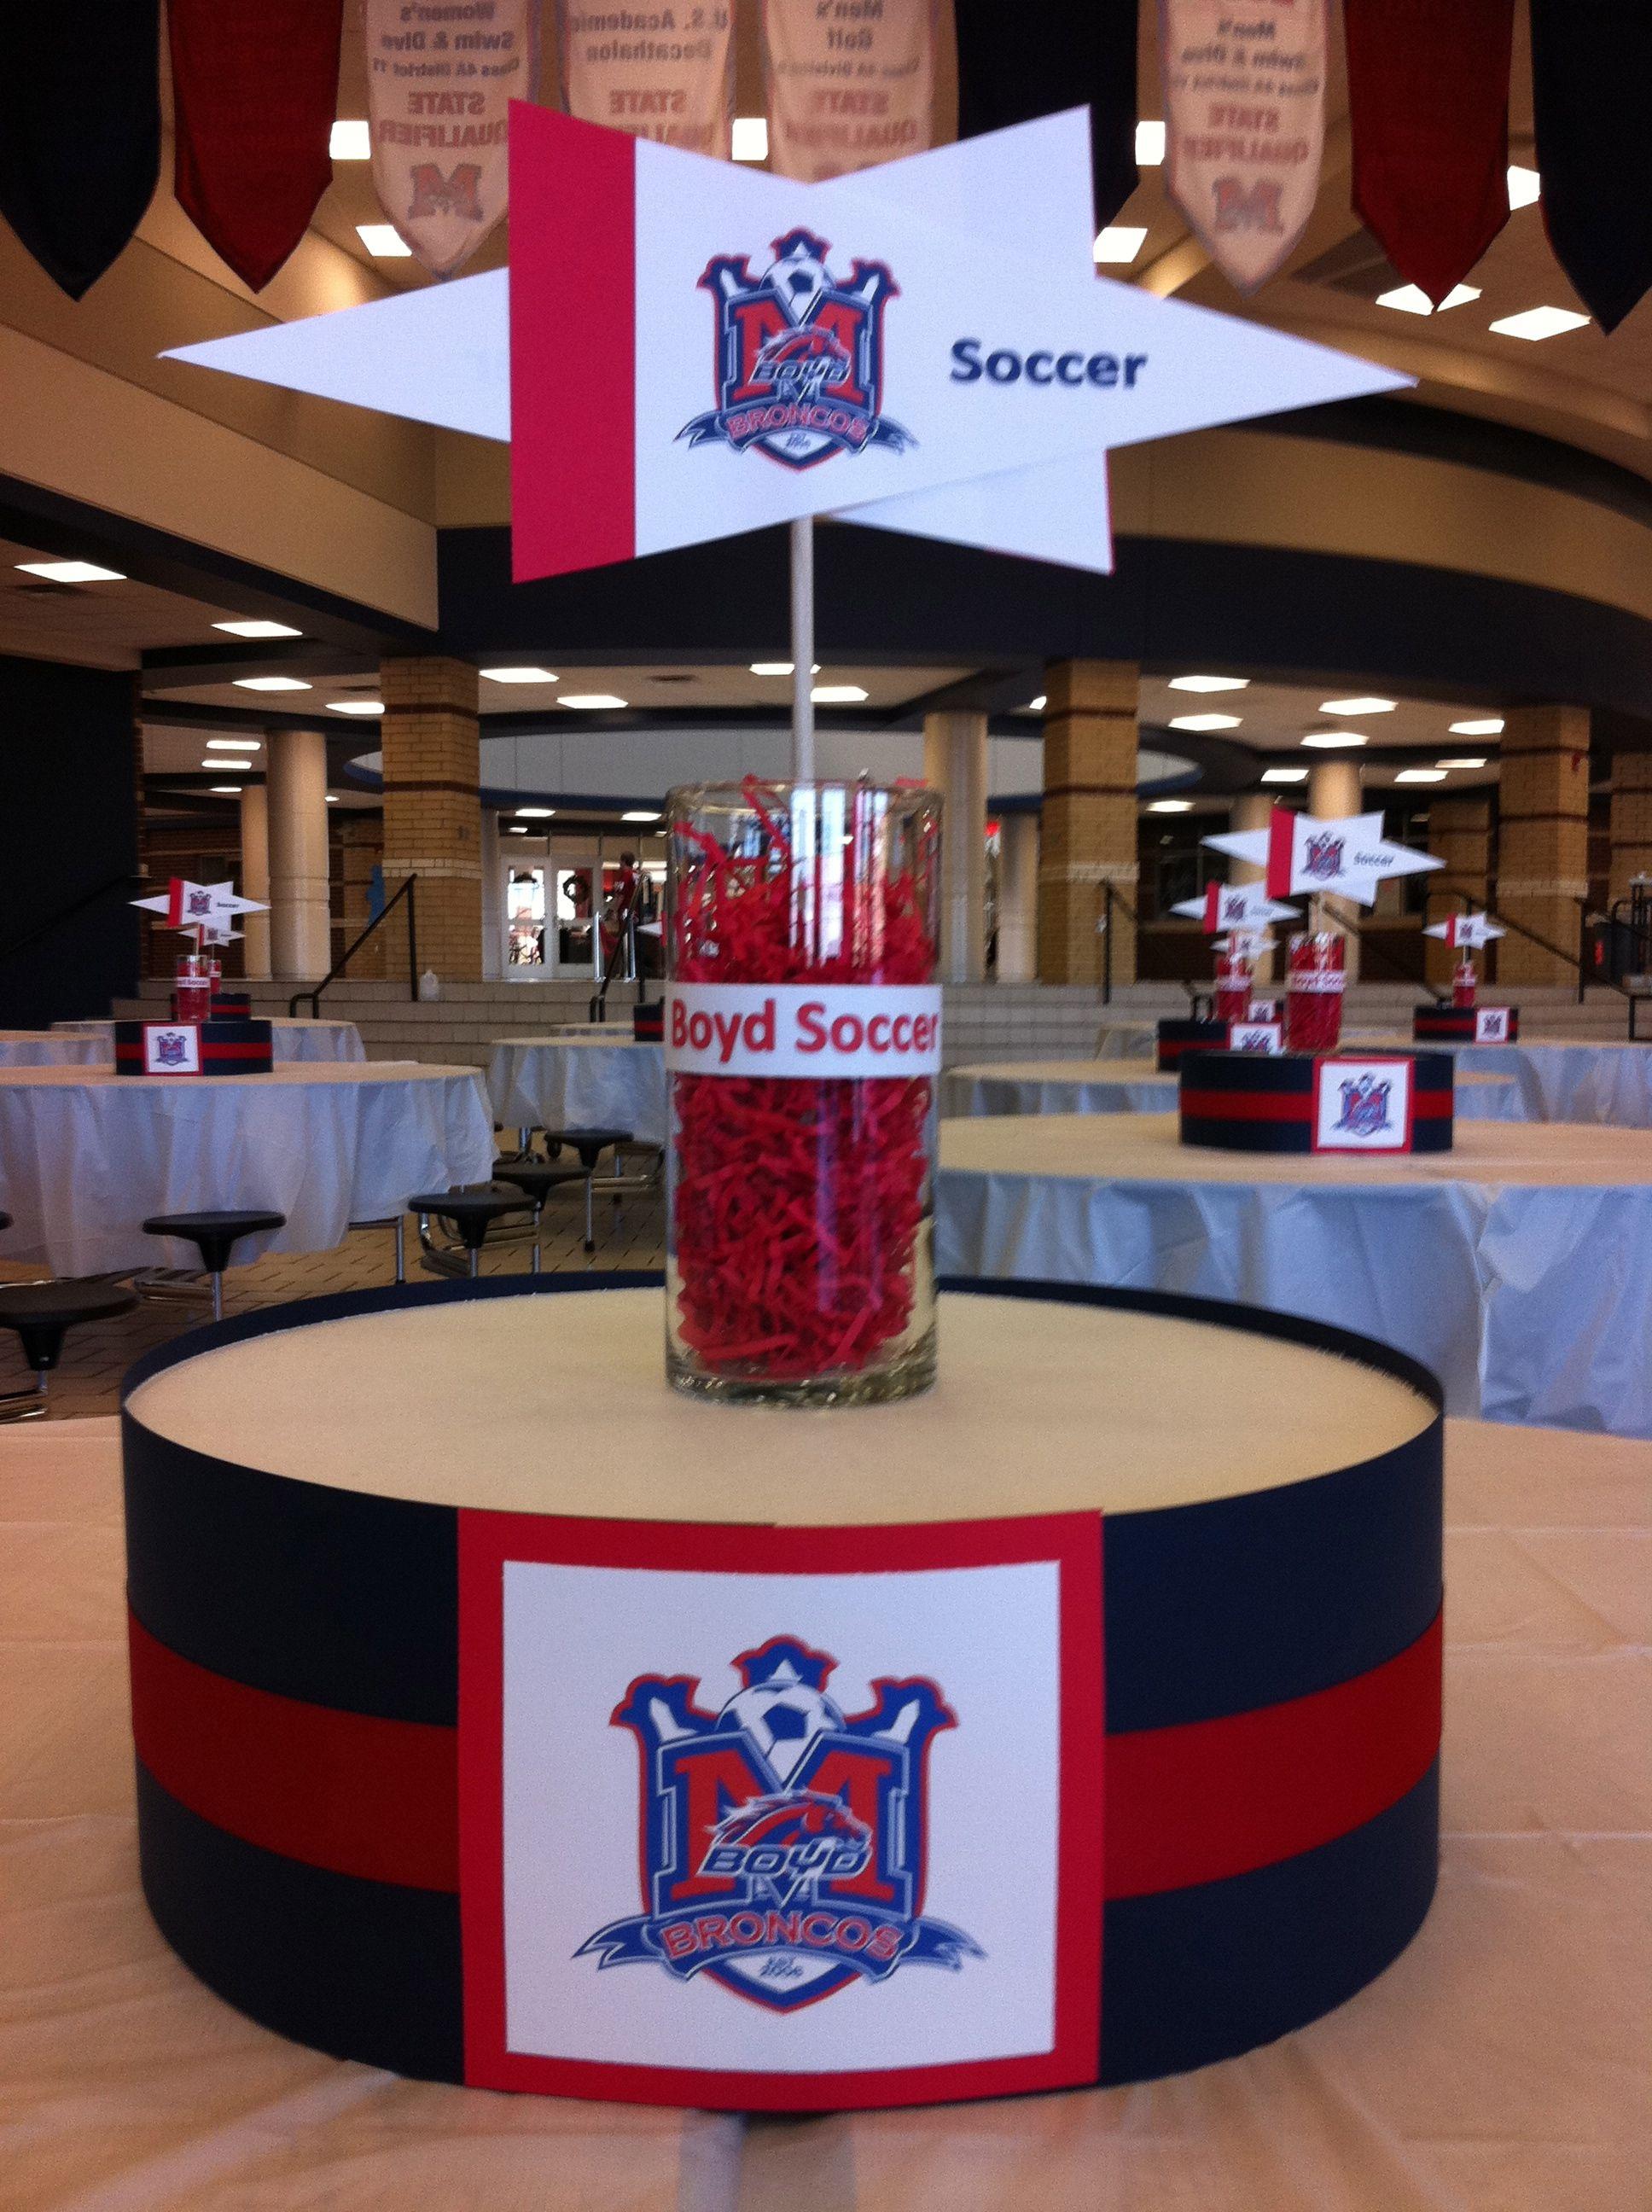 Soccer centerpiece for school kickoff dinner. We put